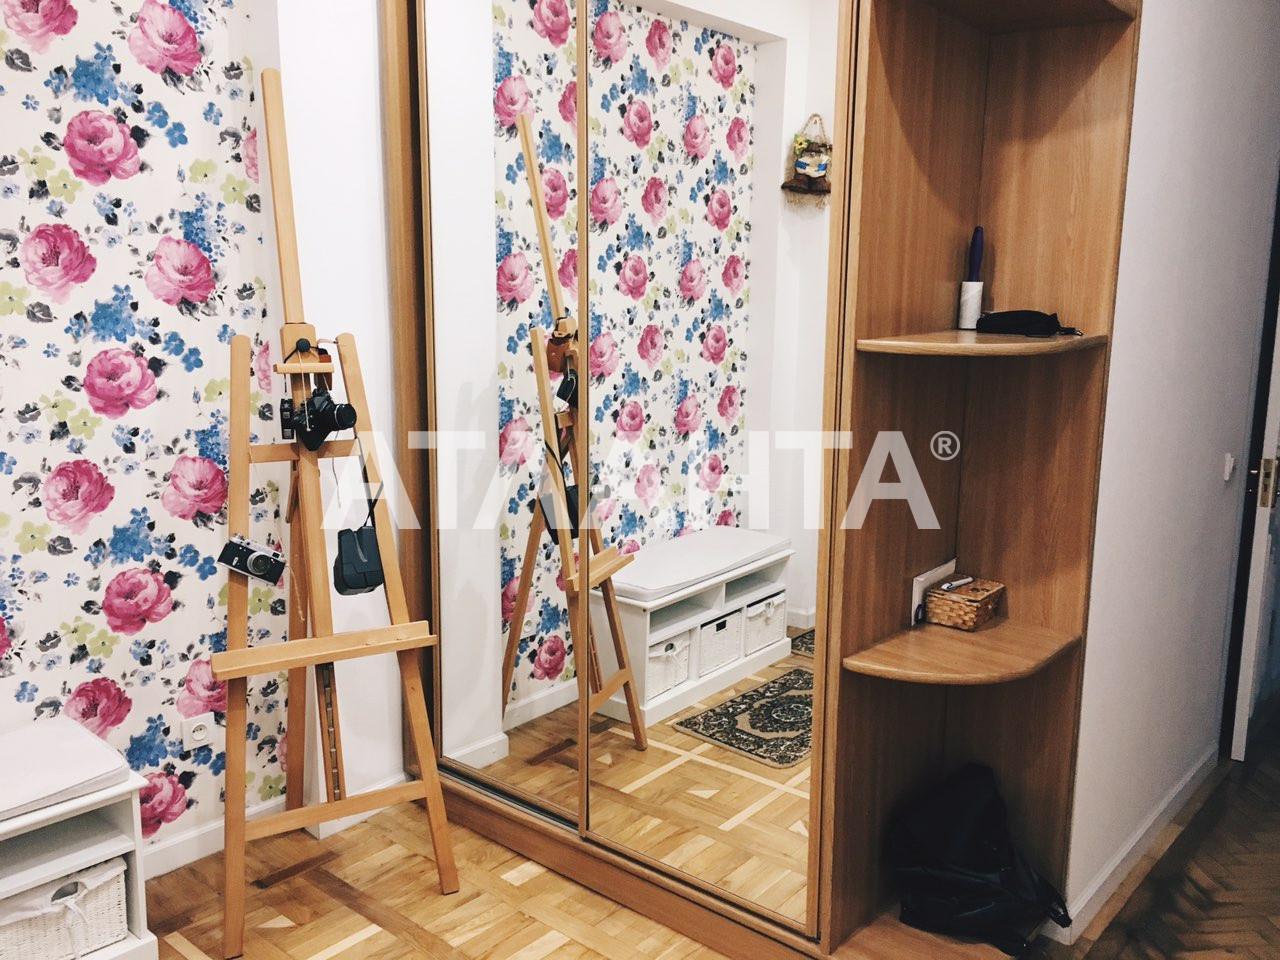 Продается 2-комнатная Квартира на ул. Семинарская (Гамарника) — 75 000 у.е. (фото №5)